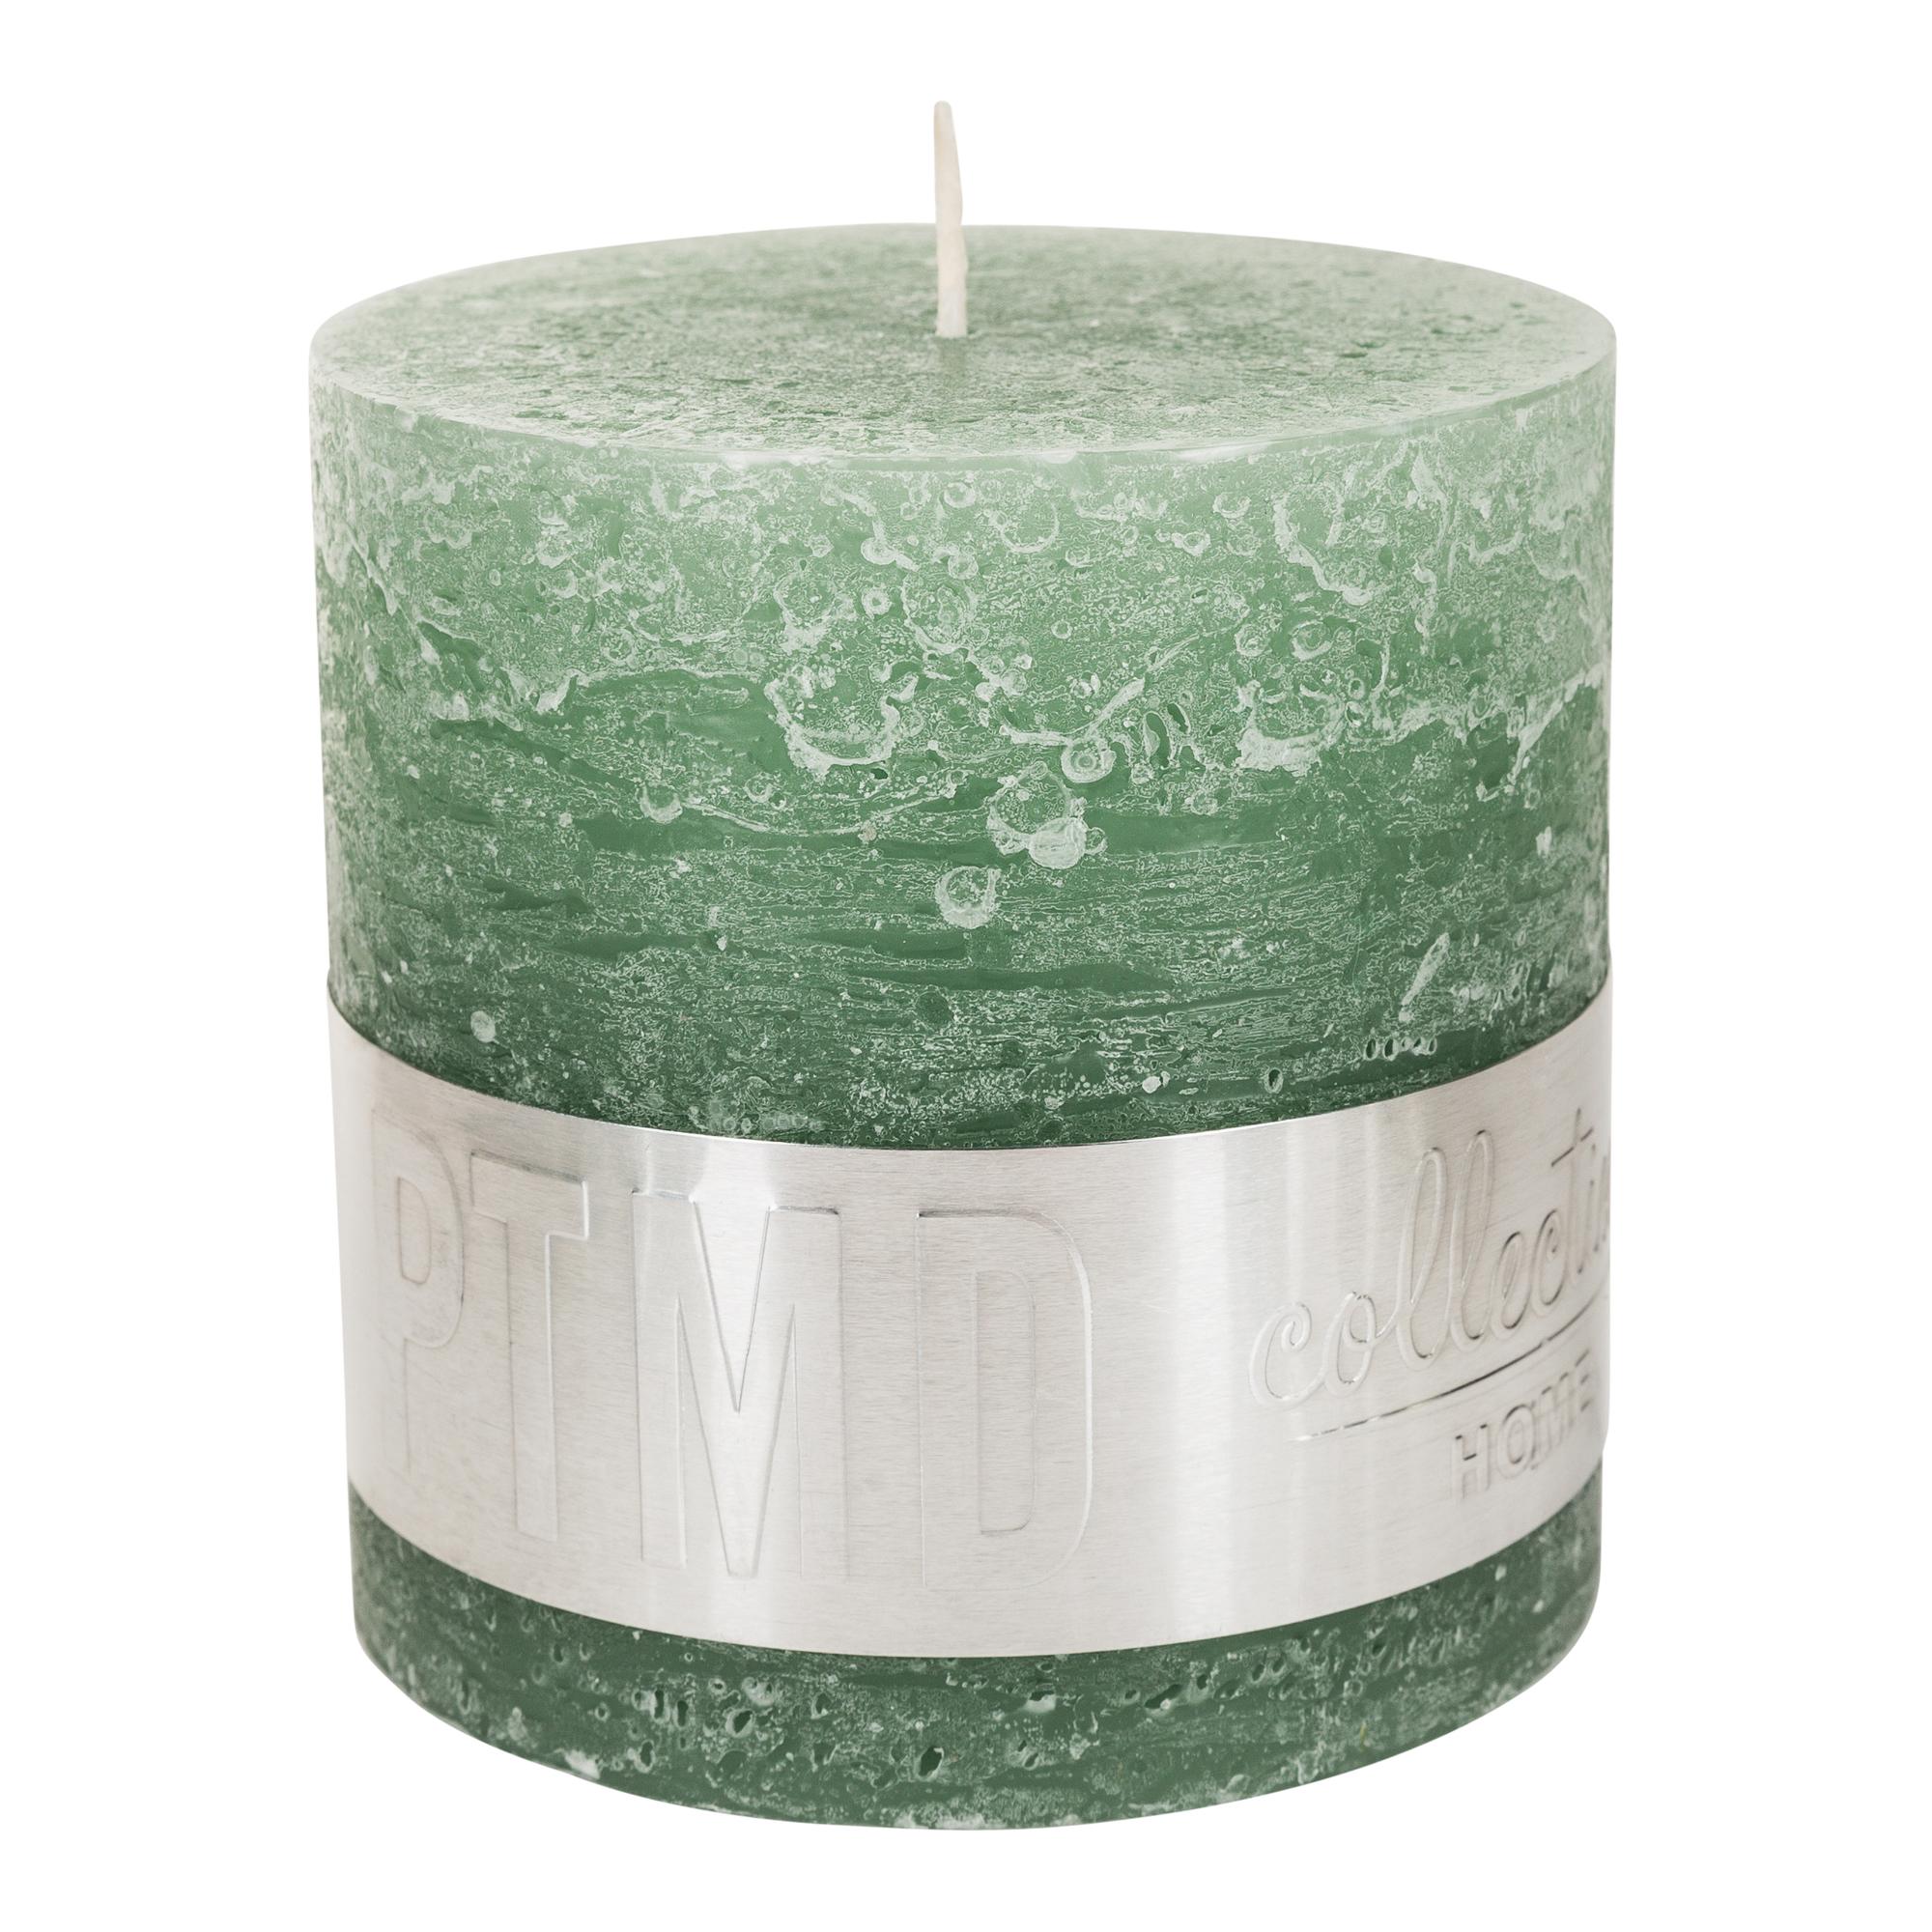 Rustic Kerze grün